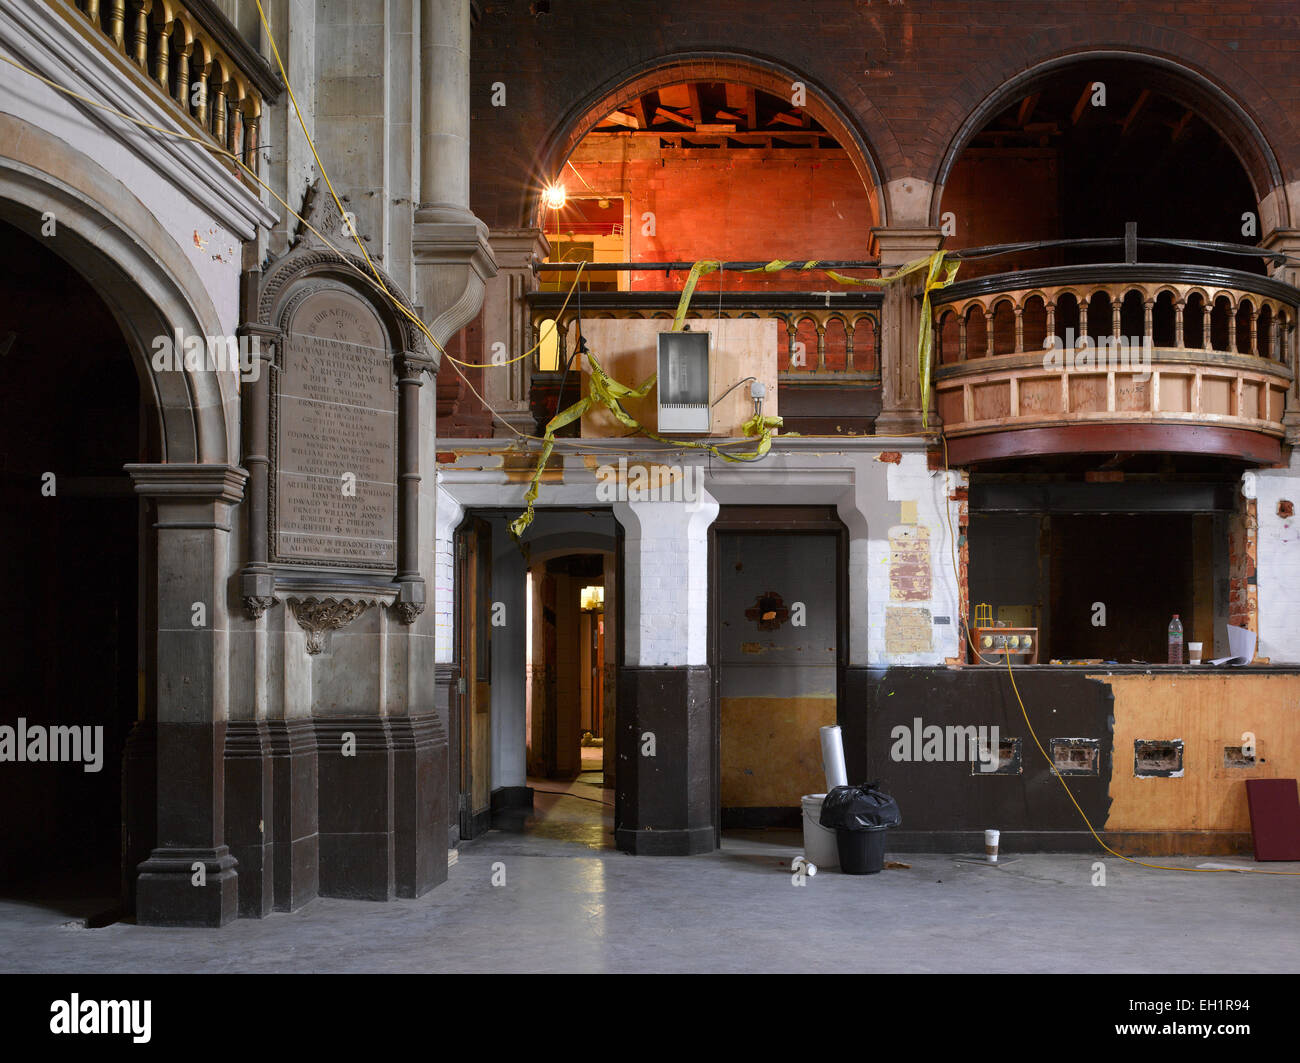 Torbögen und Balkon im Kirchensaal während der Renovierung, Waliser Kapelle, London, UK Stockbild